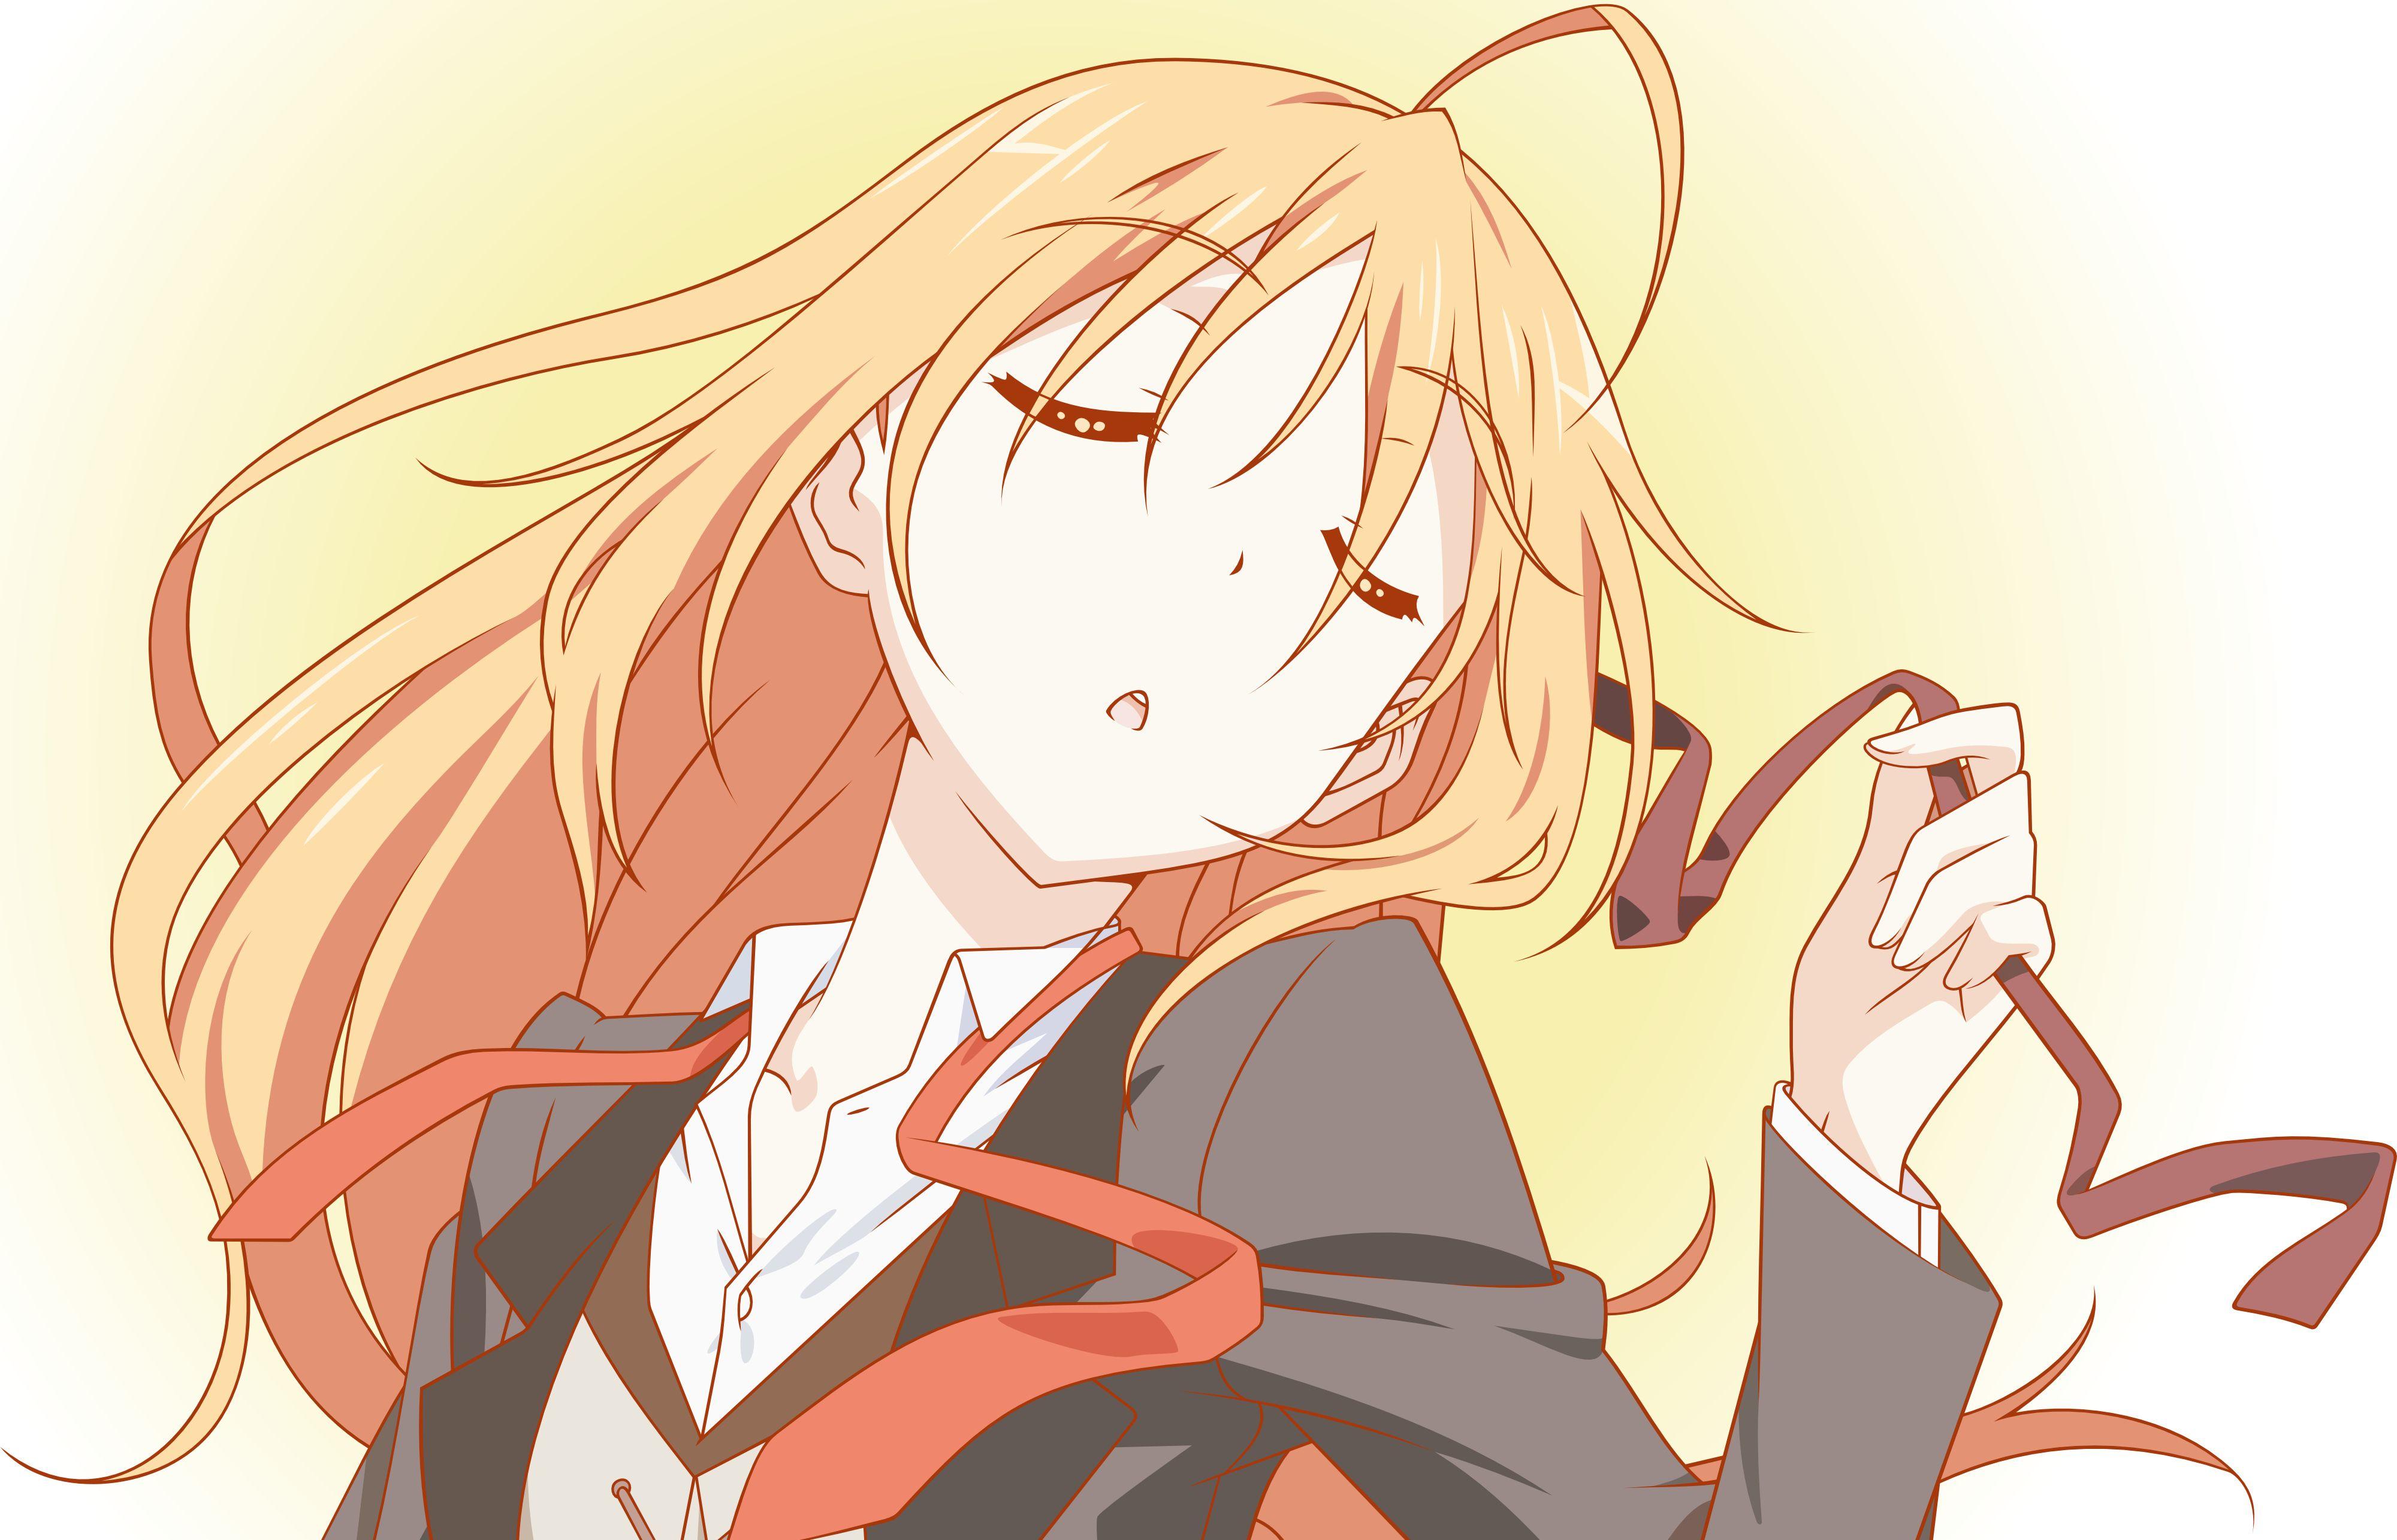 Pinterest Mayo chiki, Anime, Anime characters